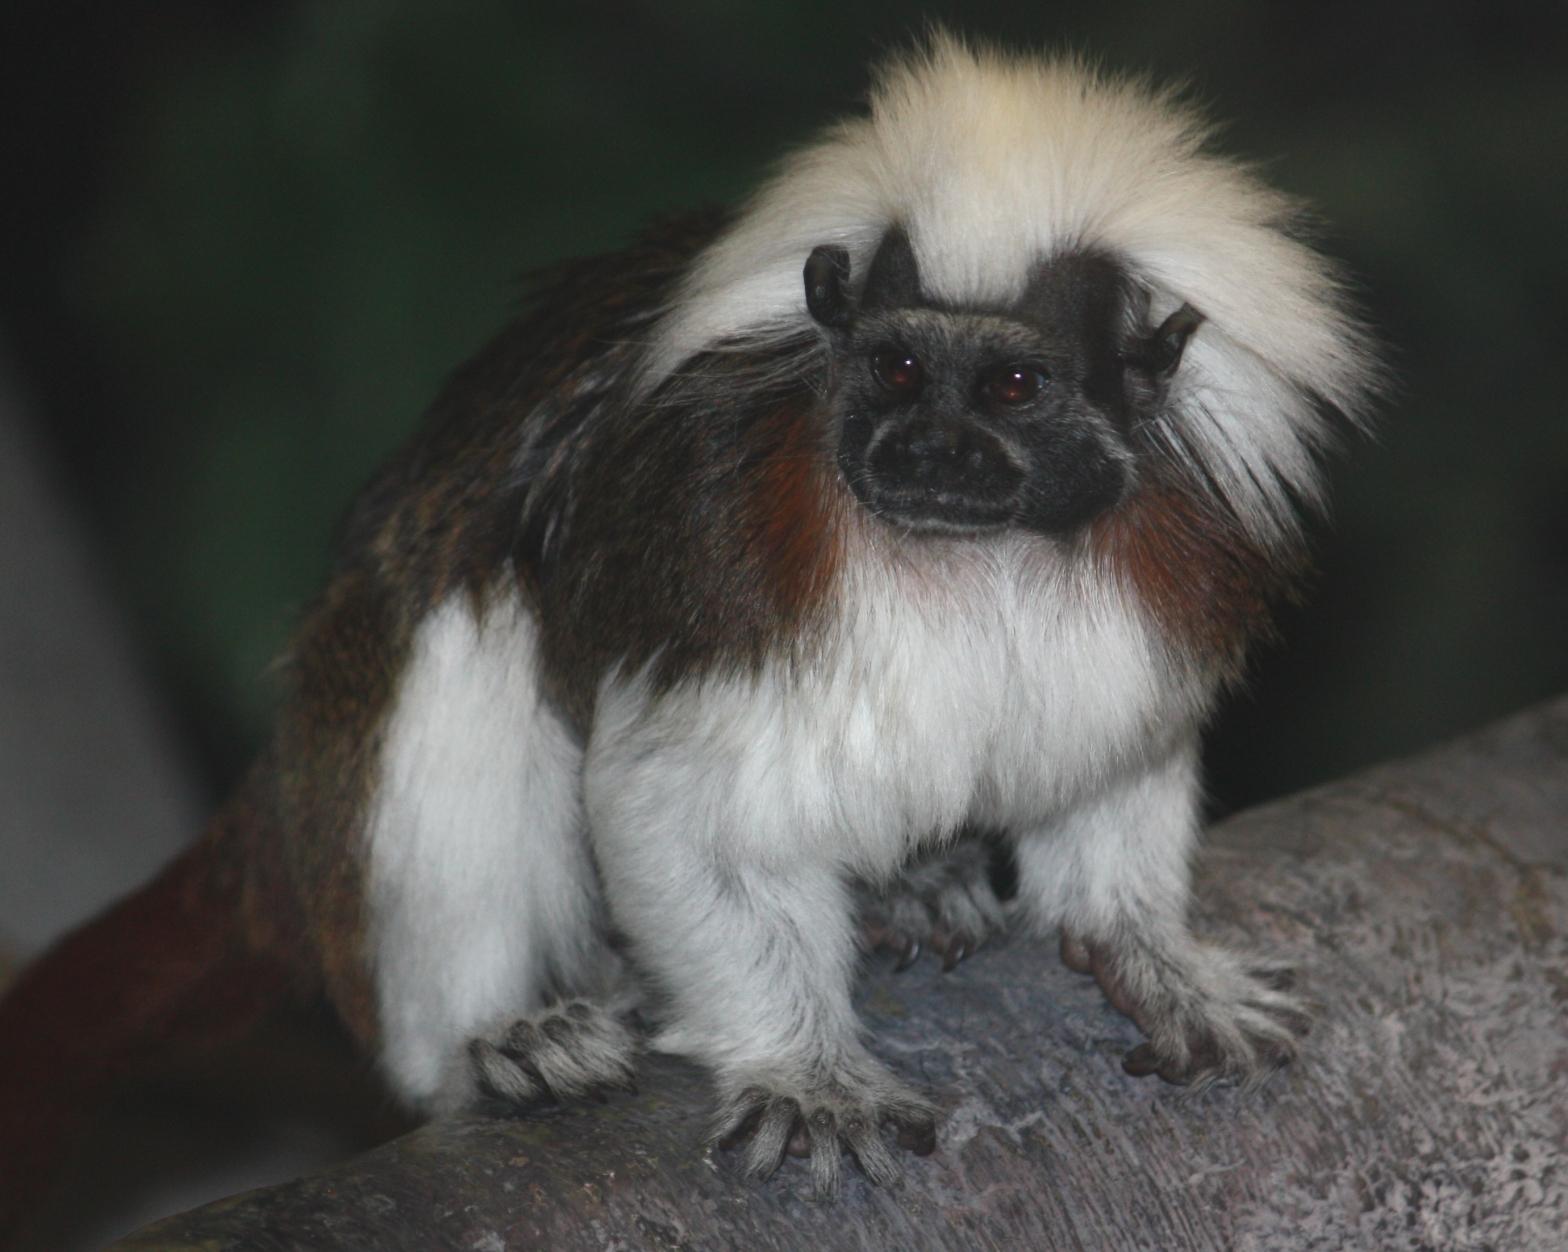 Cotton-headed Tamarin Saguinus oedipus